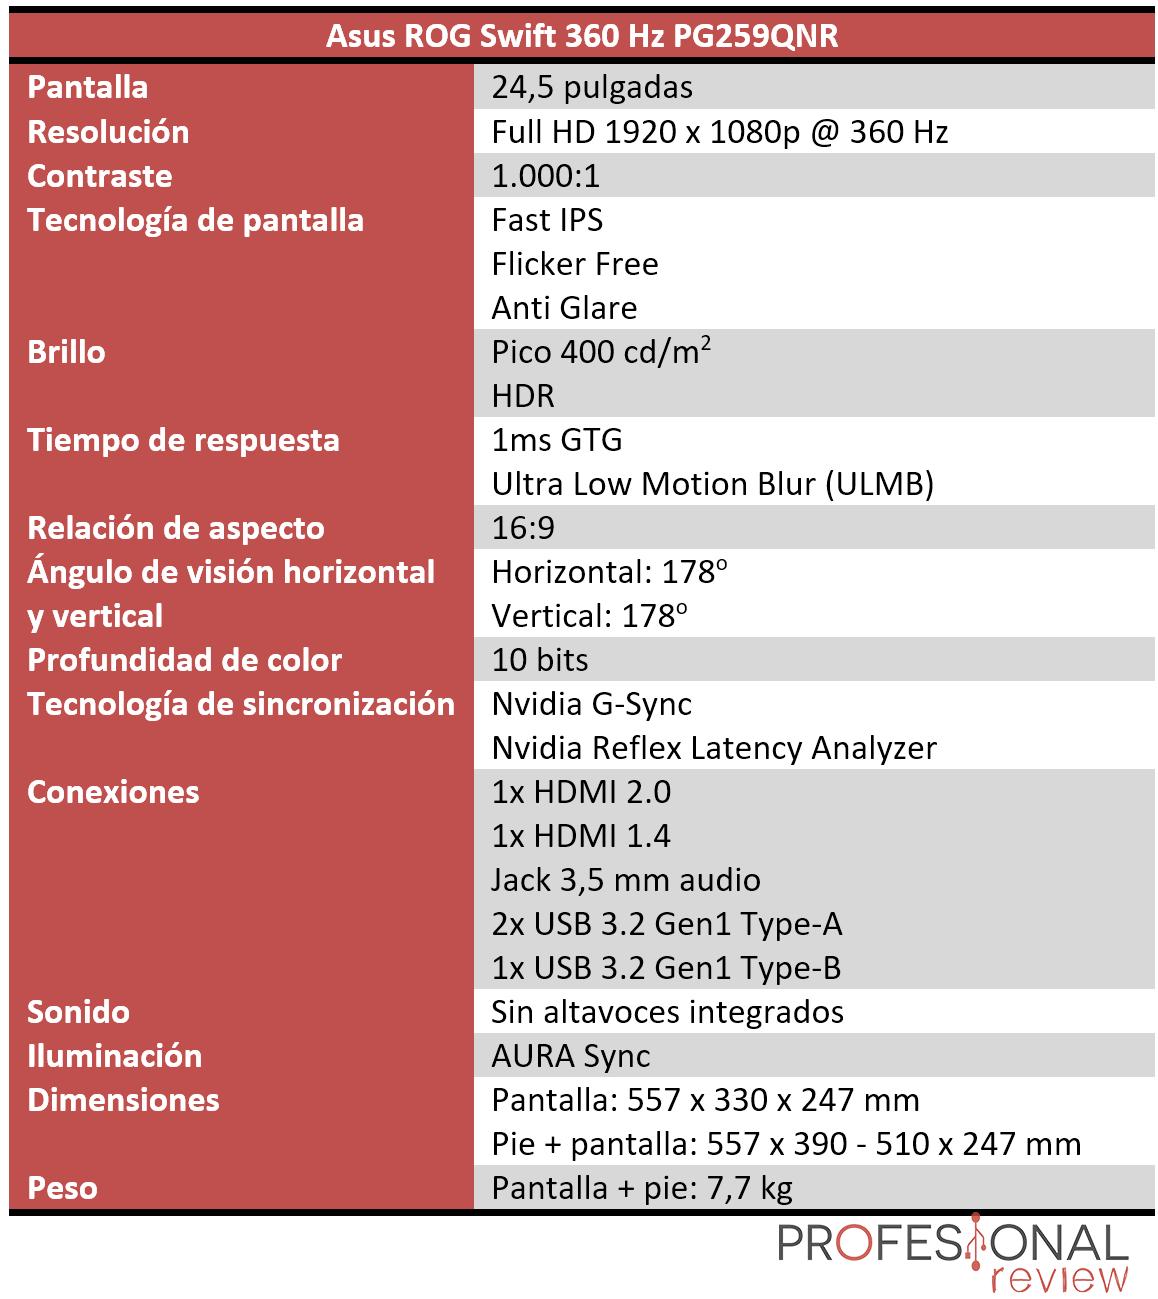 Asus ROG Swift 360 Hz PG259QNR Características